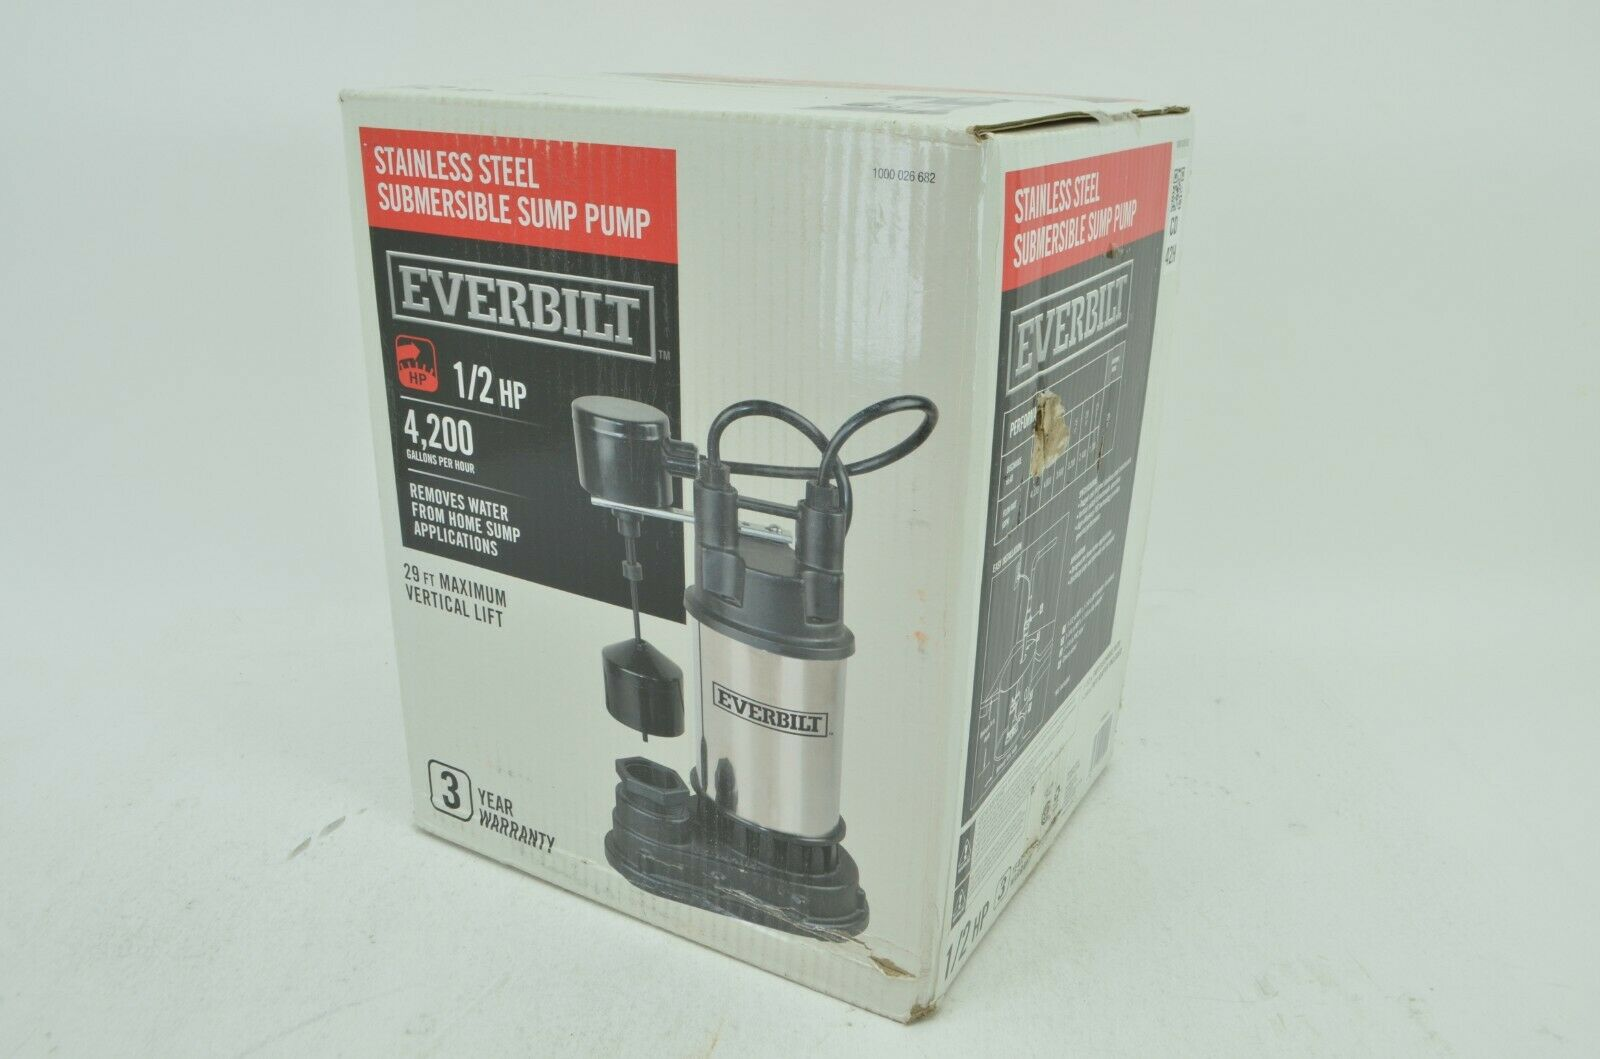 Everbilt 1/2 HP Submersible Stainless Steel Sump Pump